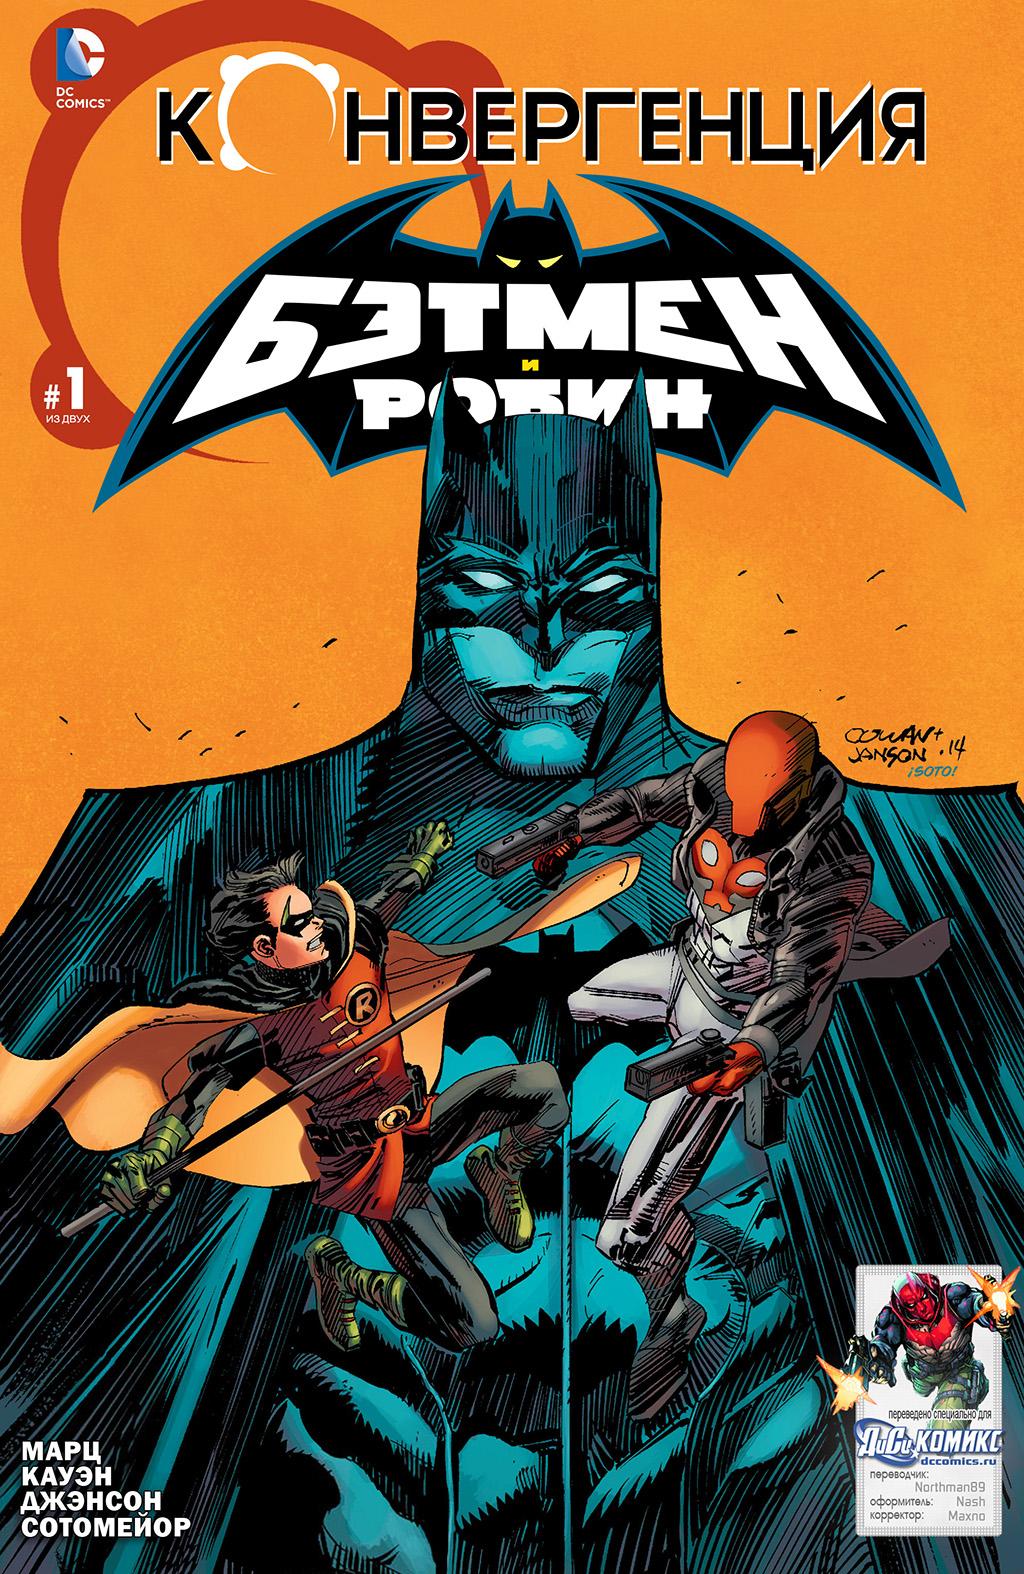 Комикс Конвергенция Бэтмен и Робин